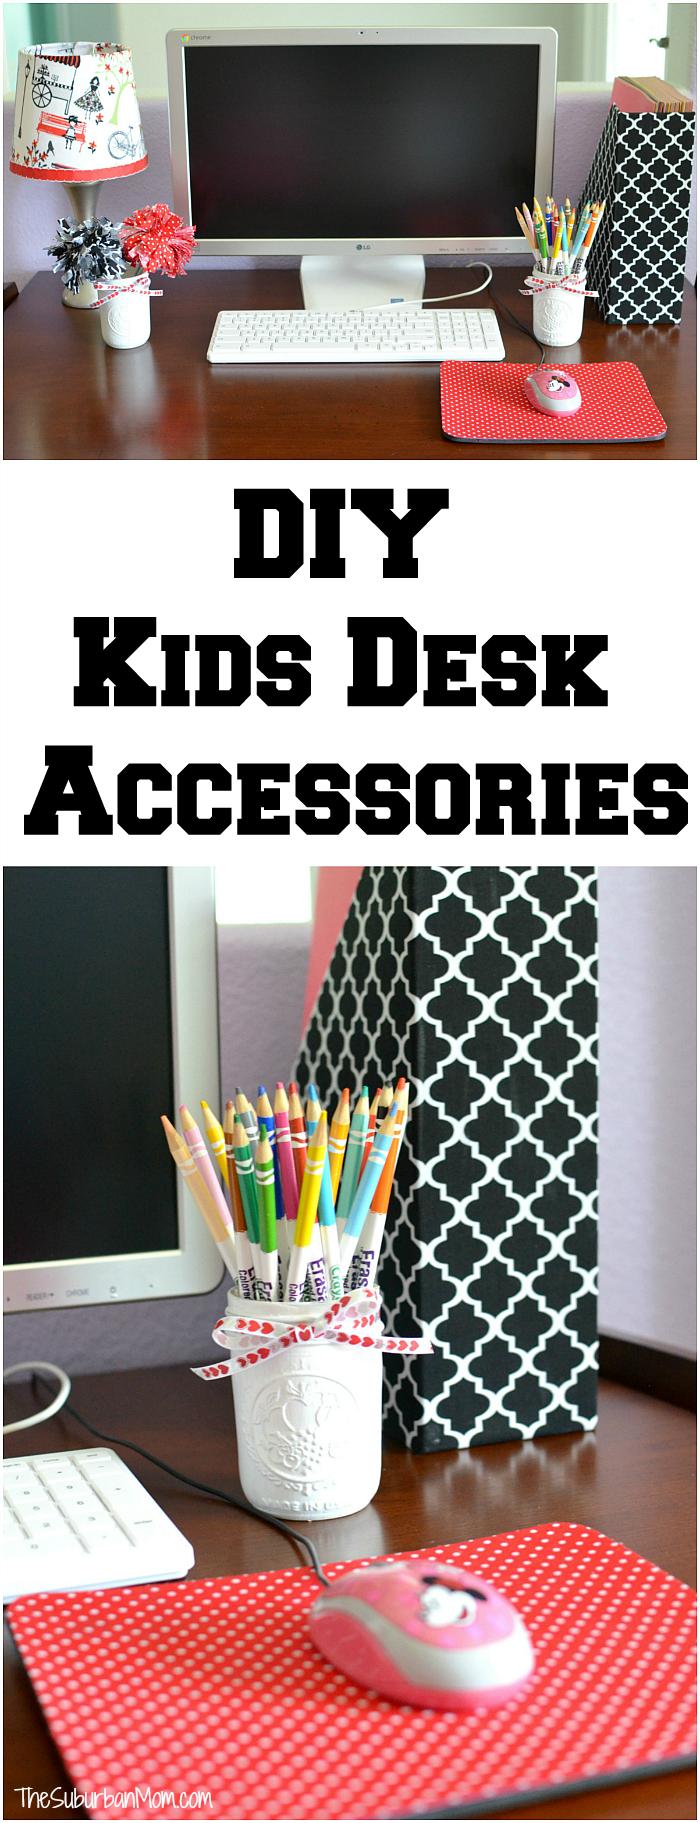 Diy kids desk accessories back to school for Diy office accessories